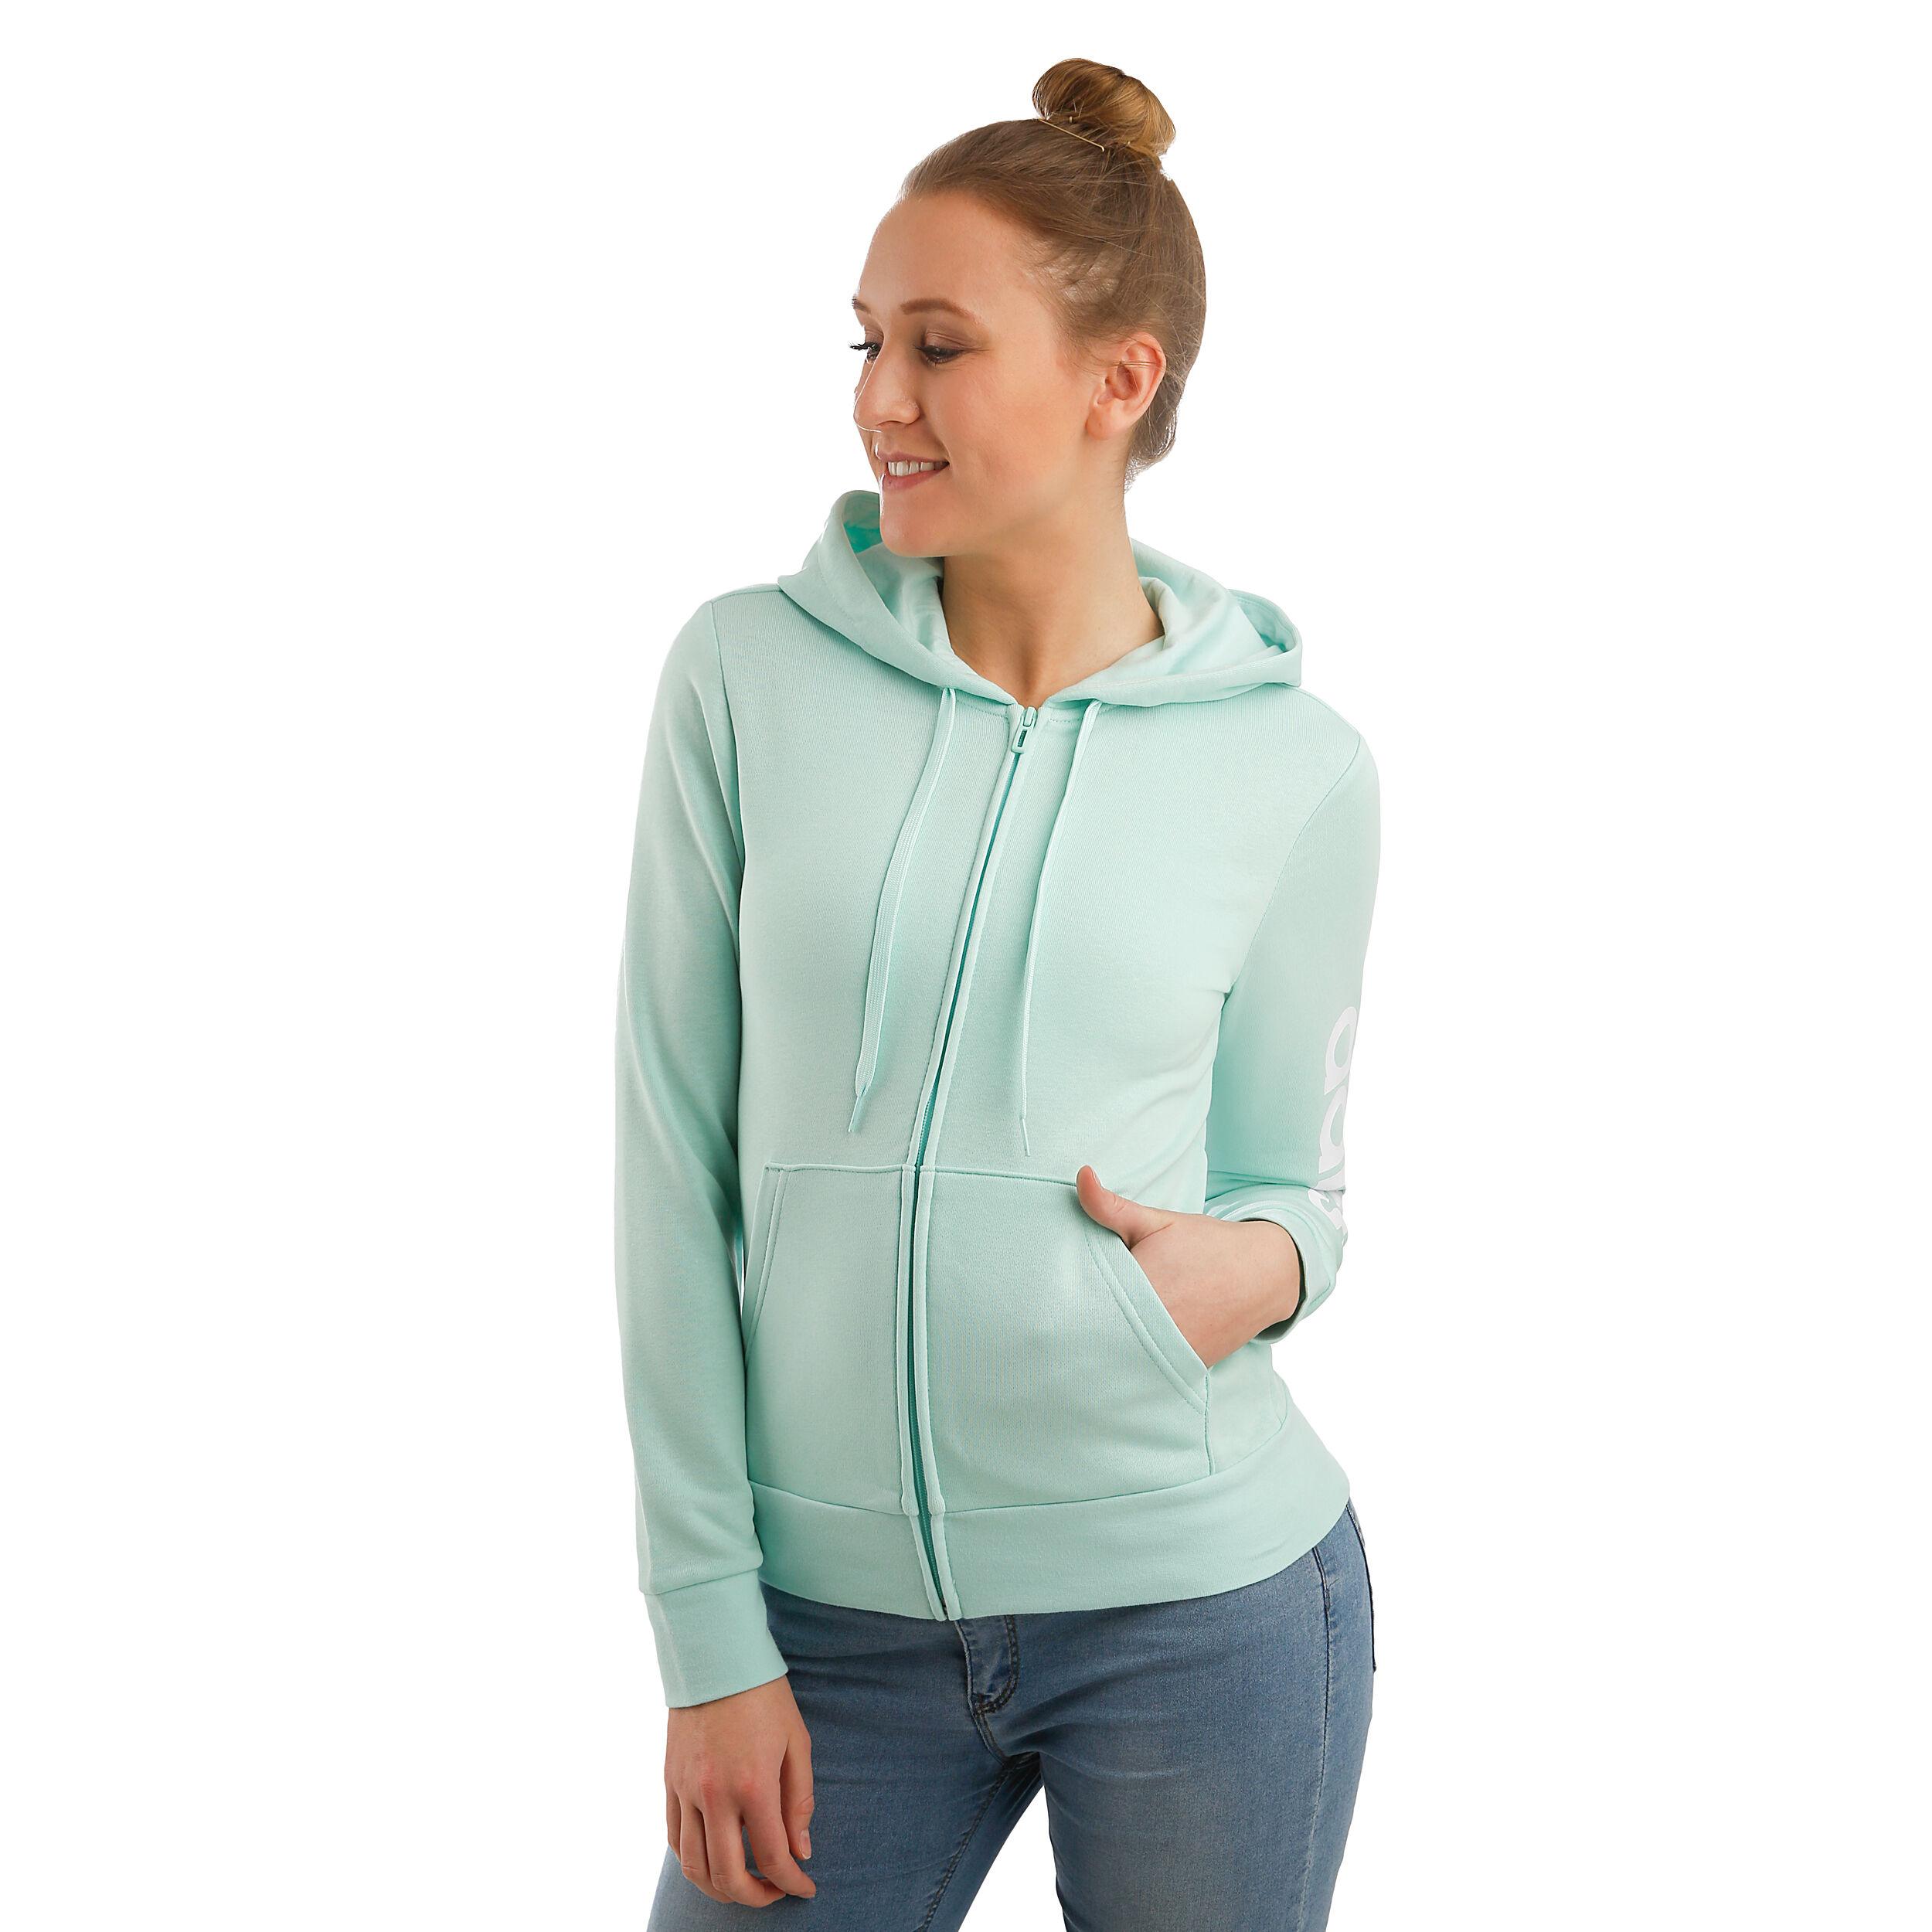 adidas Essentials Linear Full Zip Hoody Damen Mint, Weiß